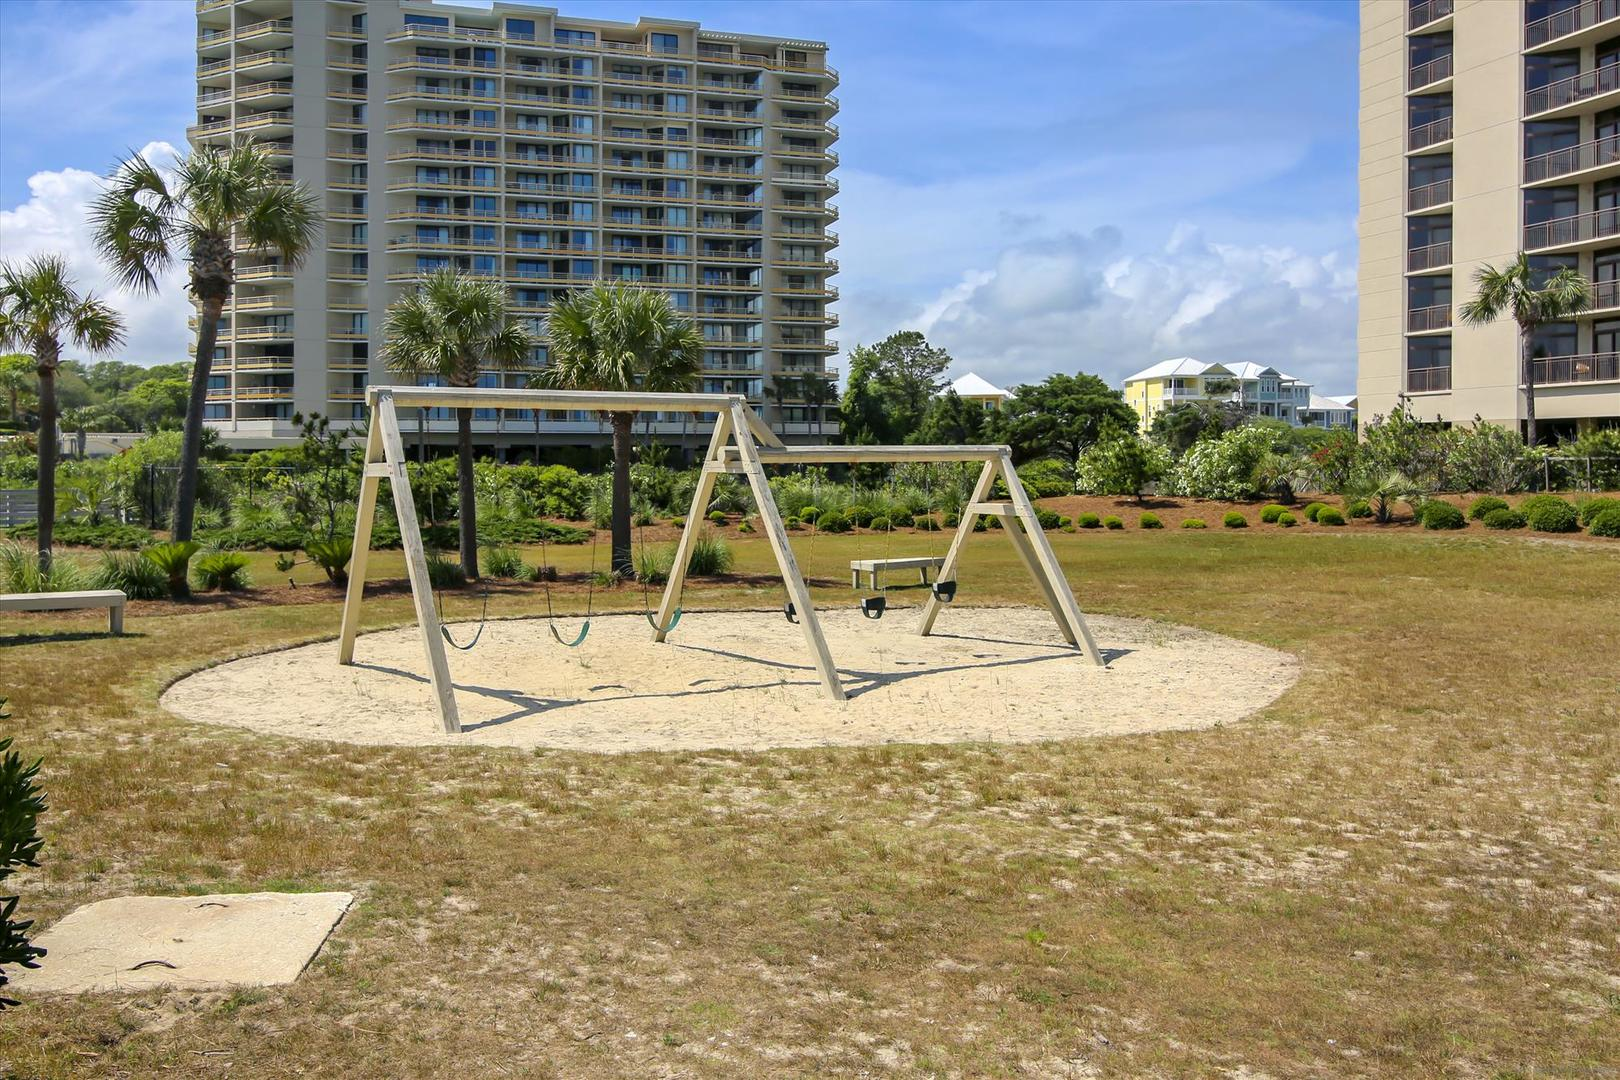 Ocean Creek NN9 - Playground